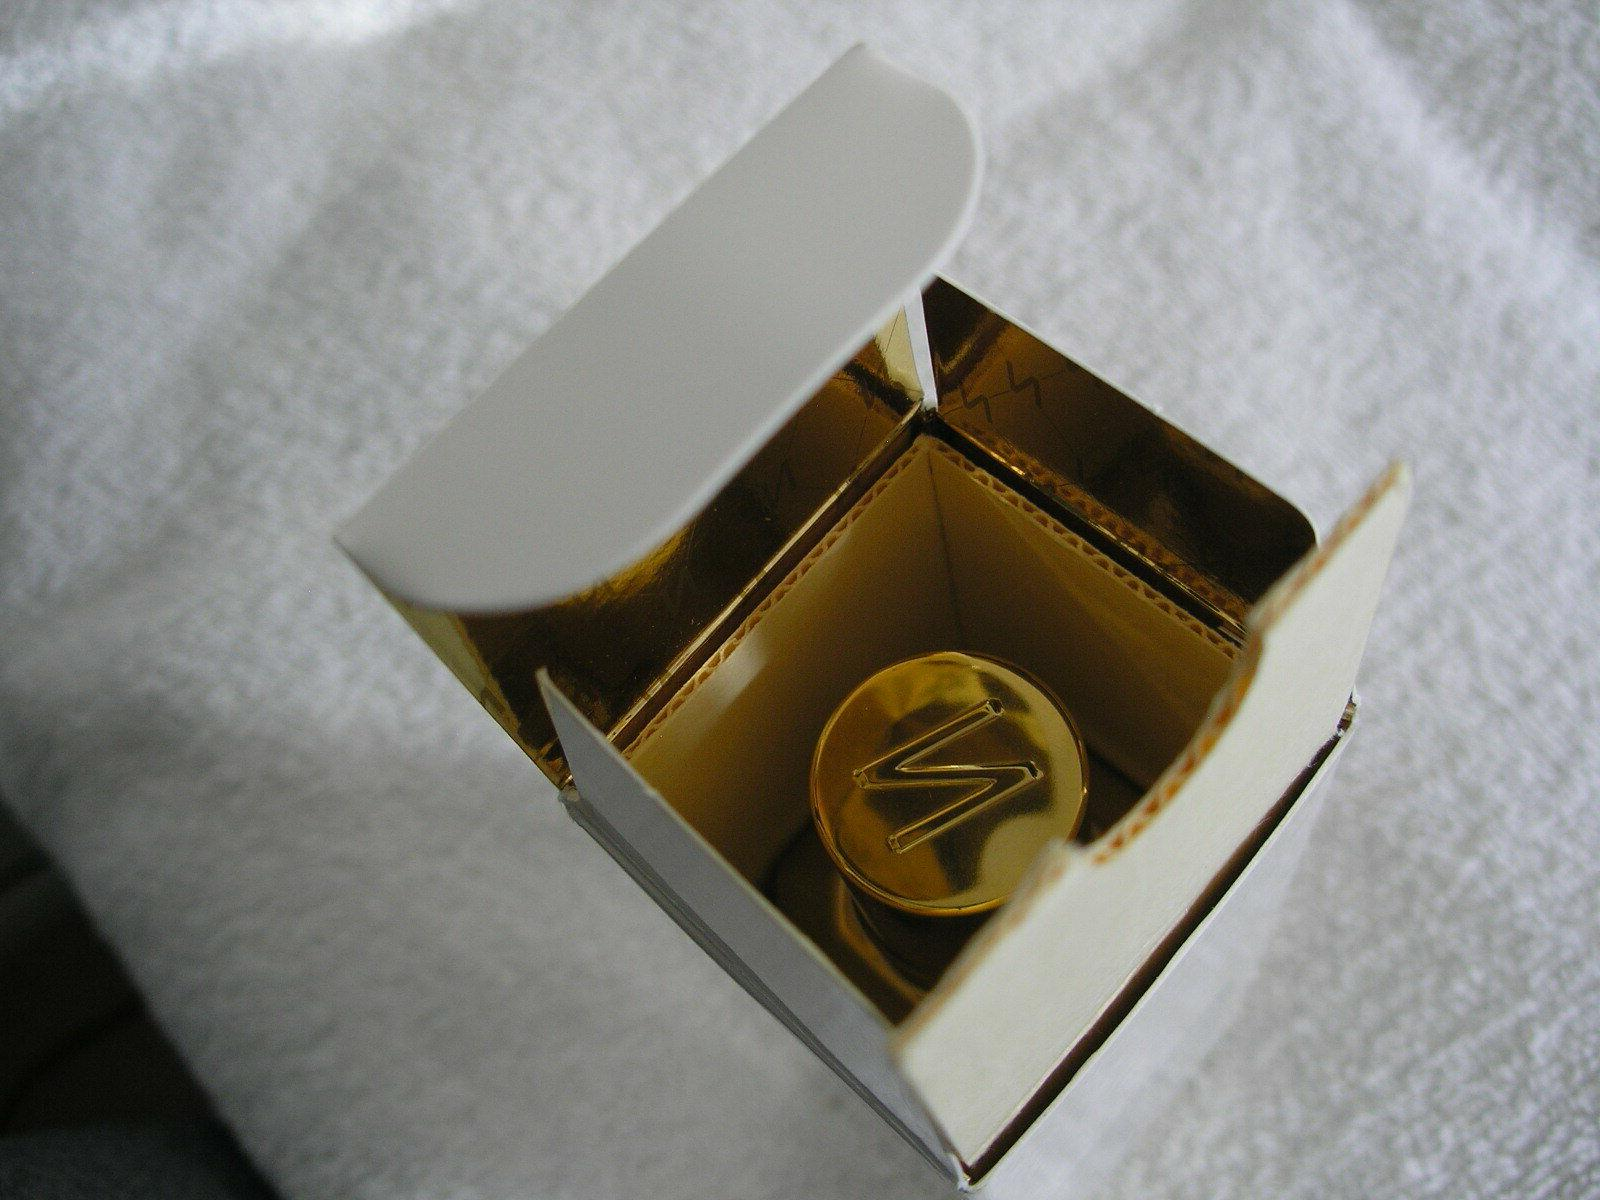 NEW Five Star Fragrances 2.3 69ml Eau Cologne Natural